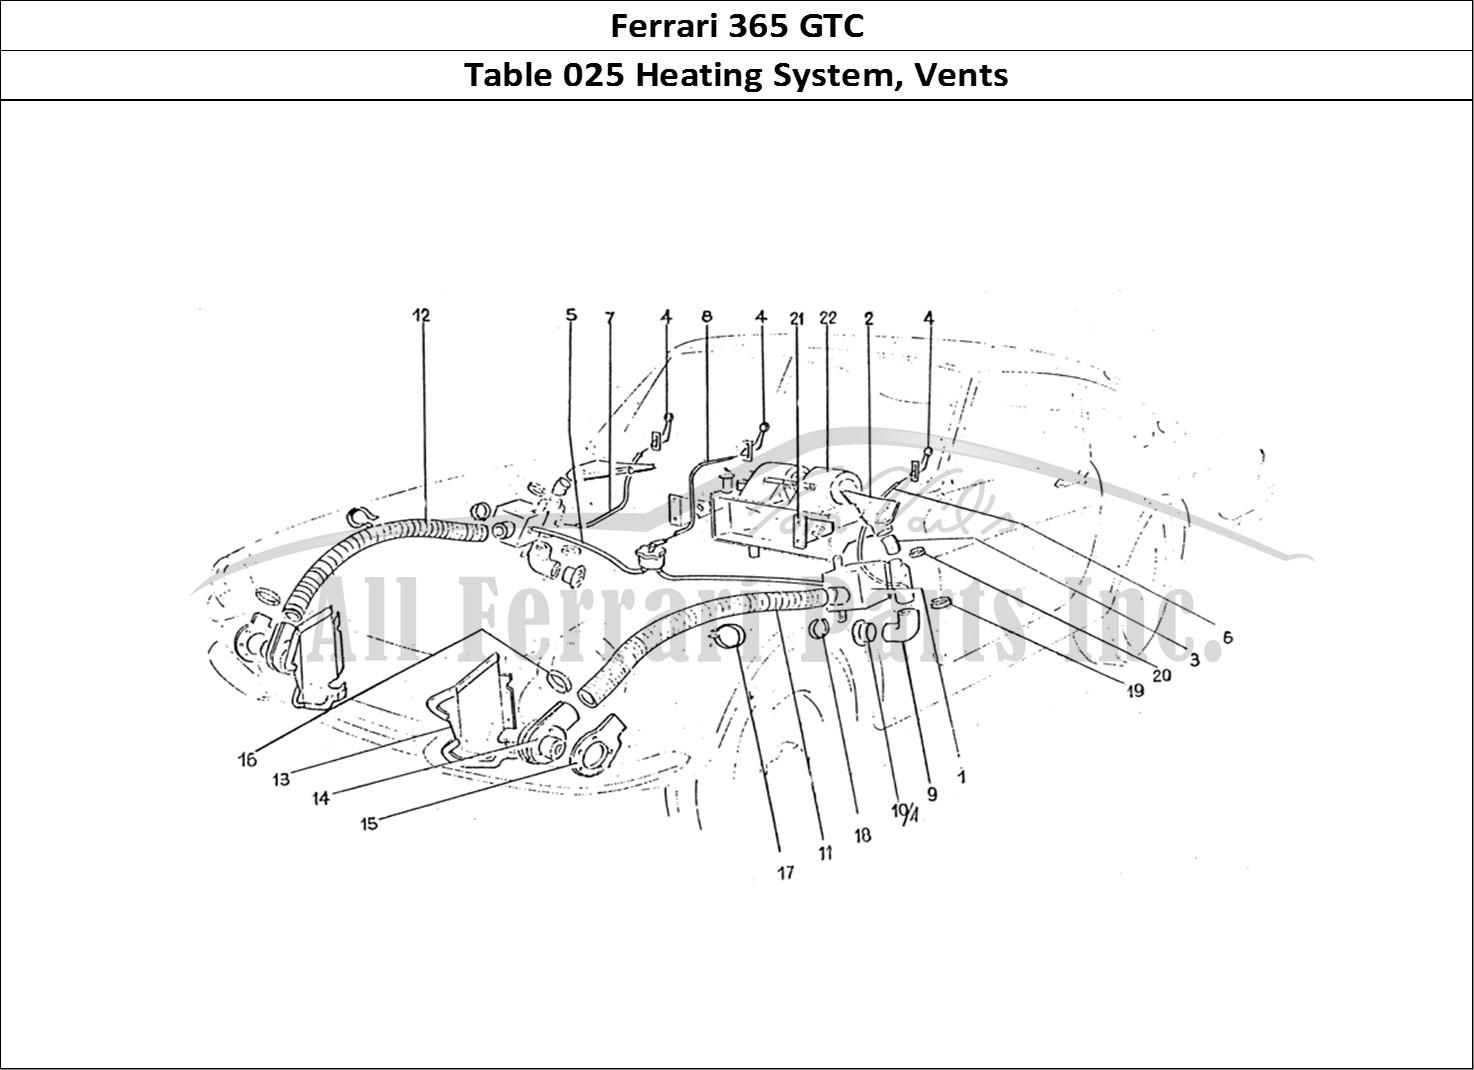 Buy Original Ferrari 365 Gtc 025 Heating System Vents